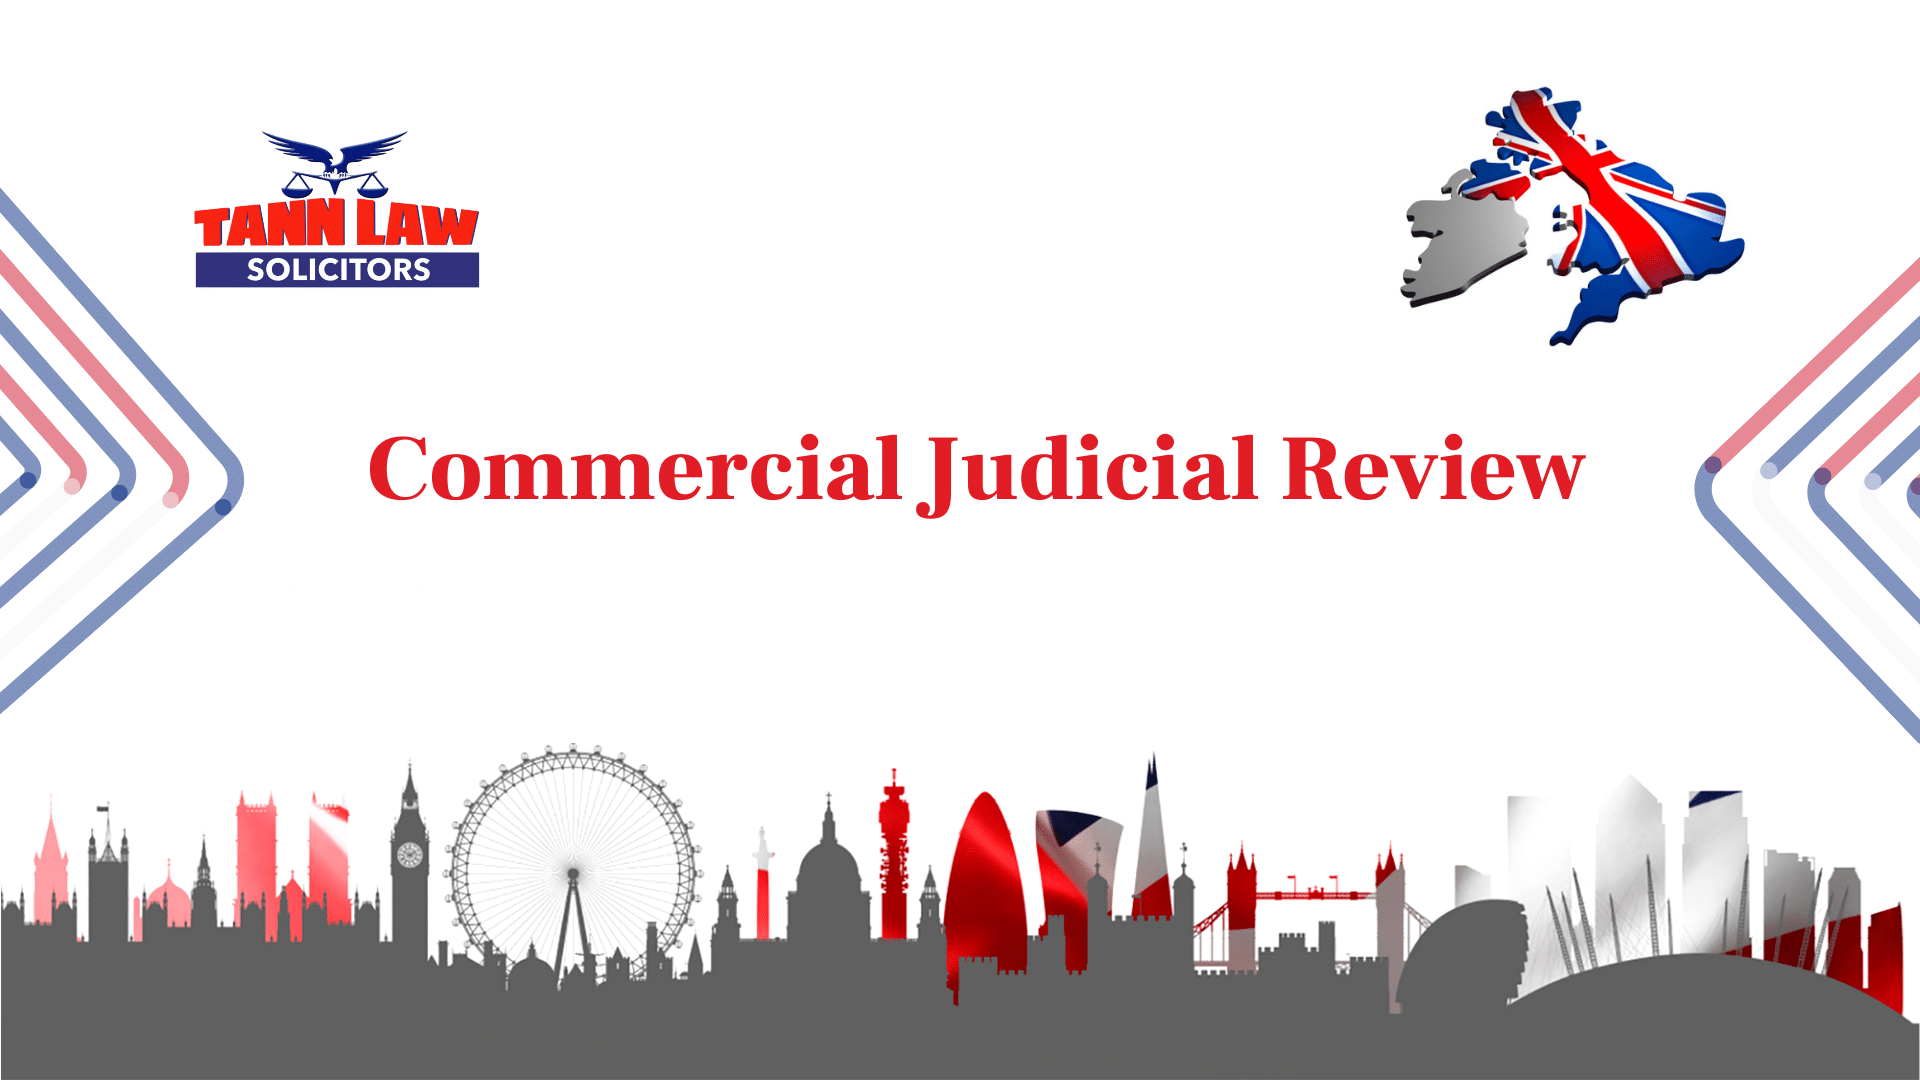 Commercial Judicial Review